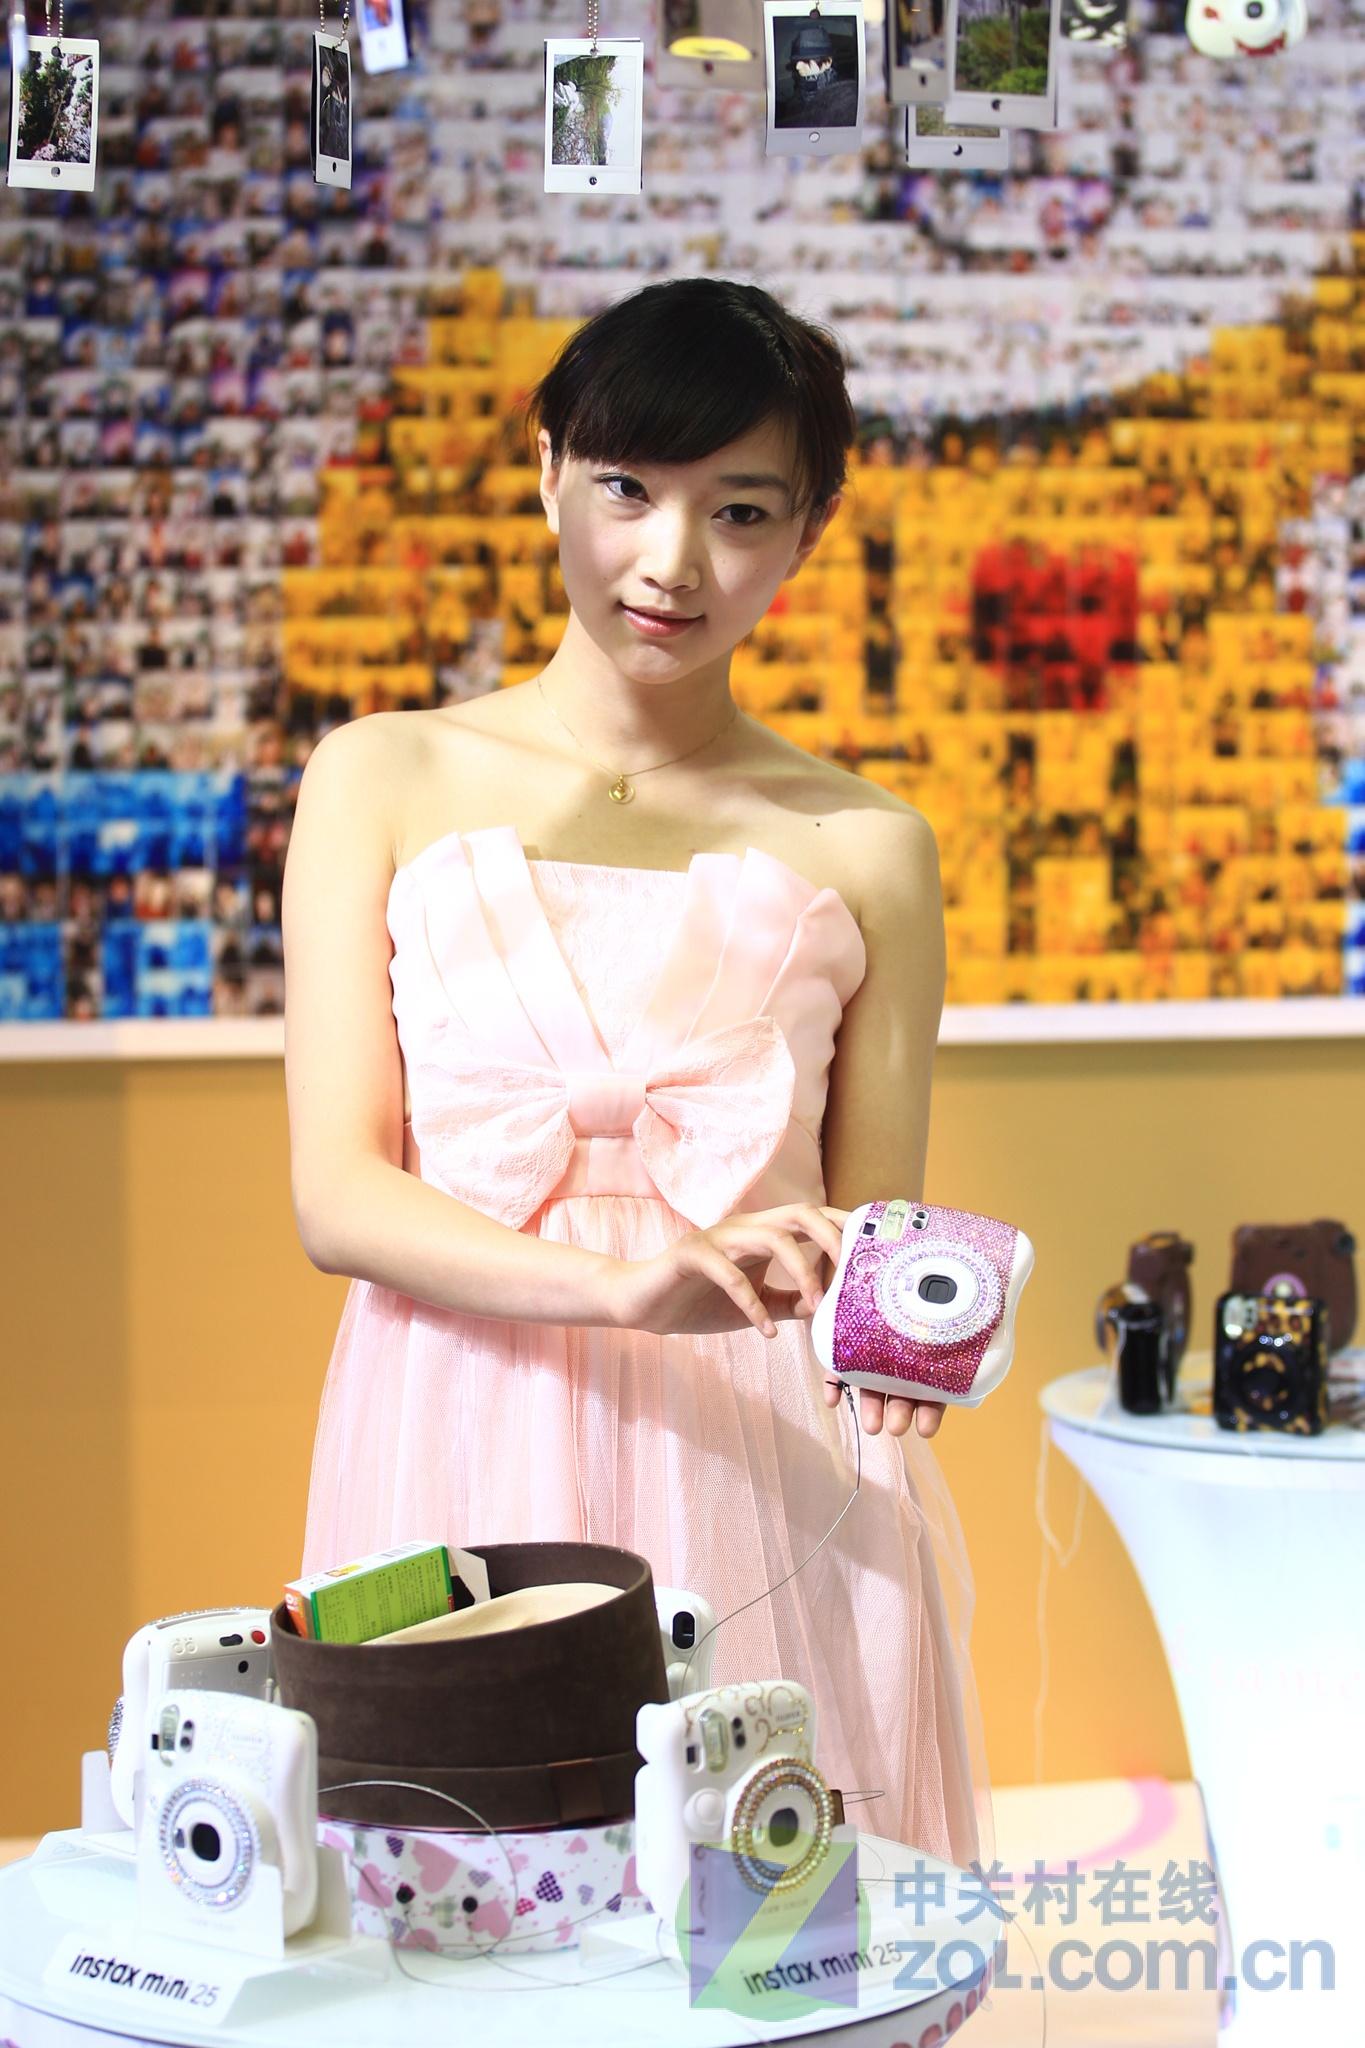 p&e2012:轻松熊小可爱 富士美女搜罗